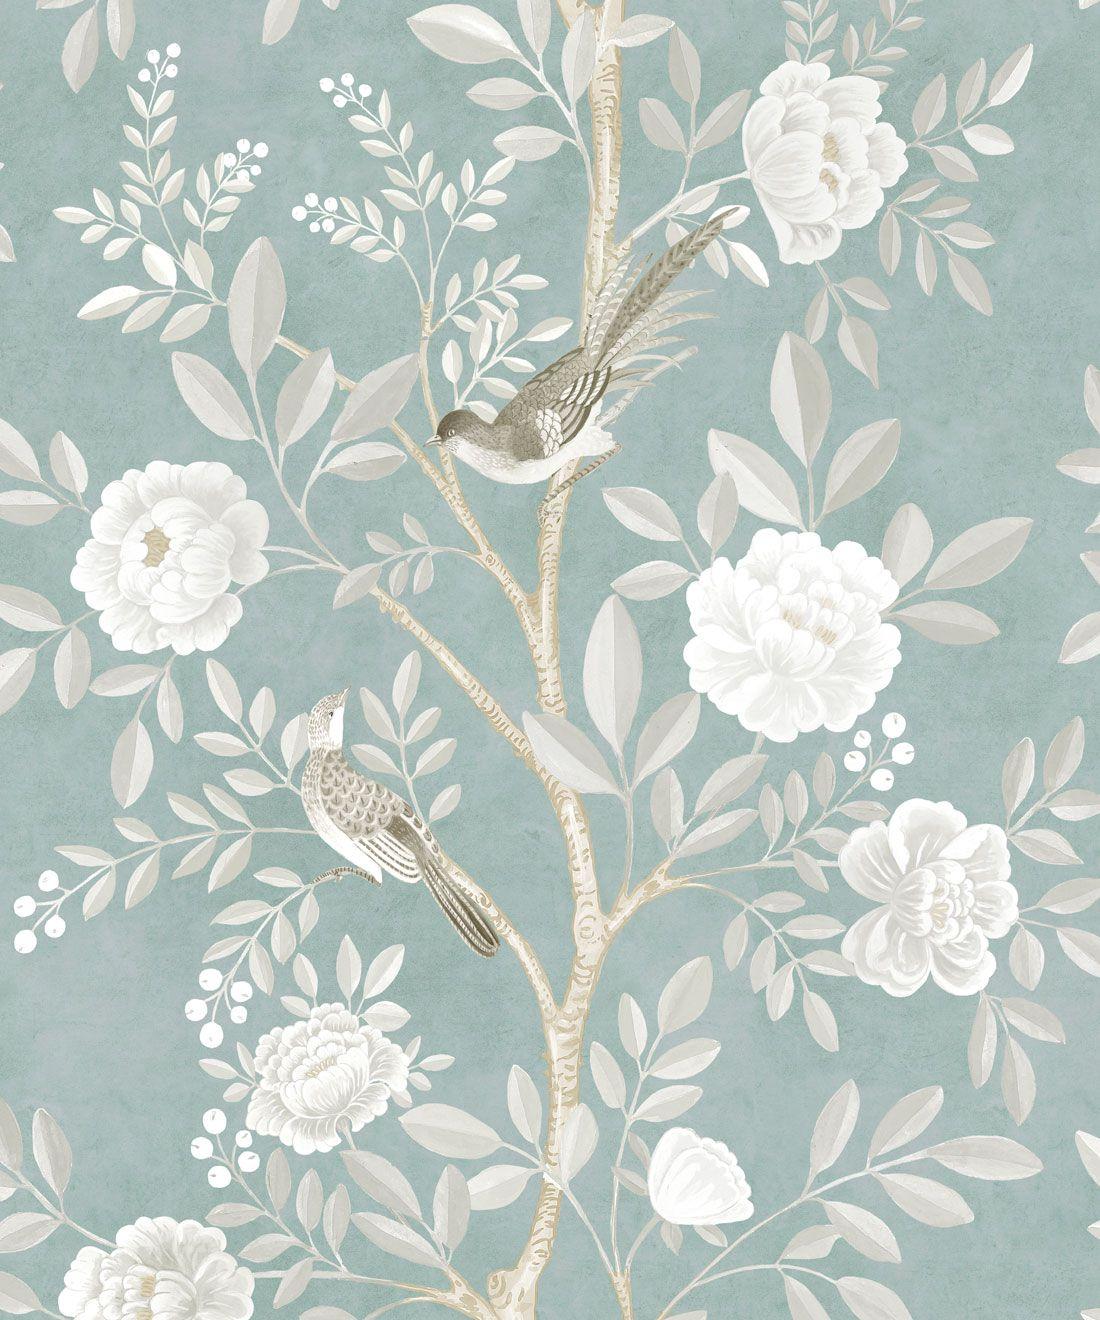 Chinoiserie Wallpaper •Floral Wallpaper •Bird Wallpaper • Magnolia • Milk Green • Swatch